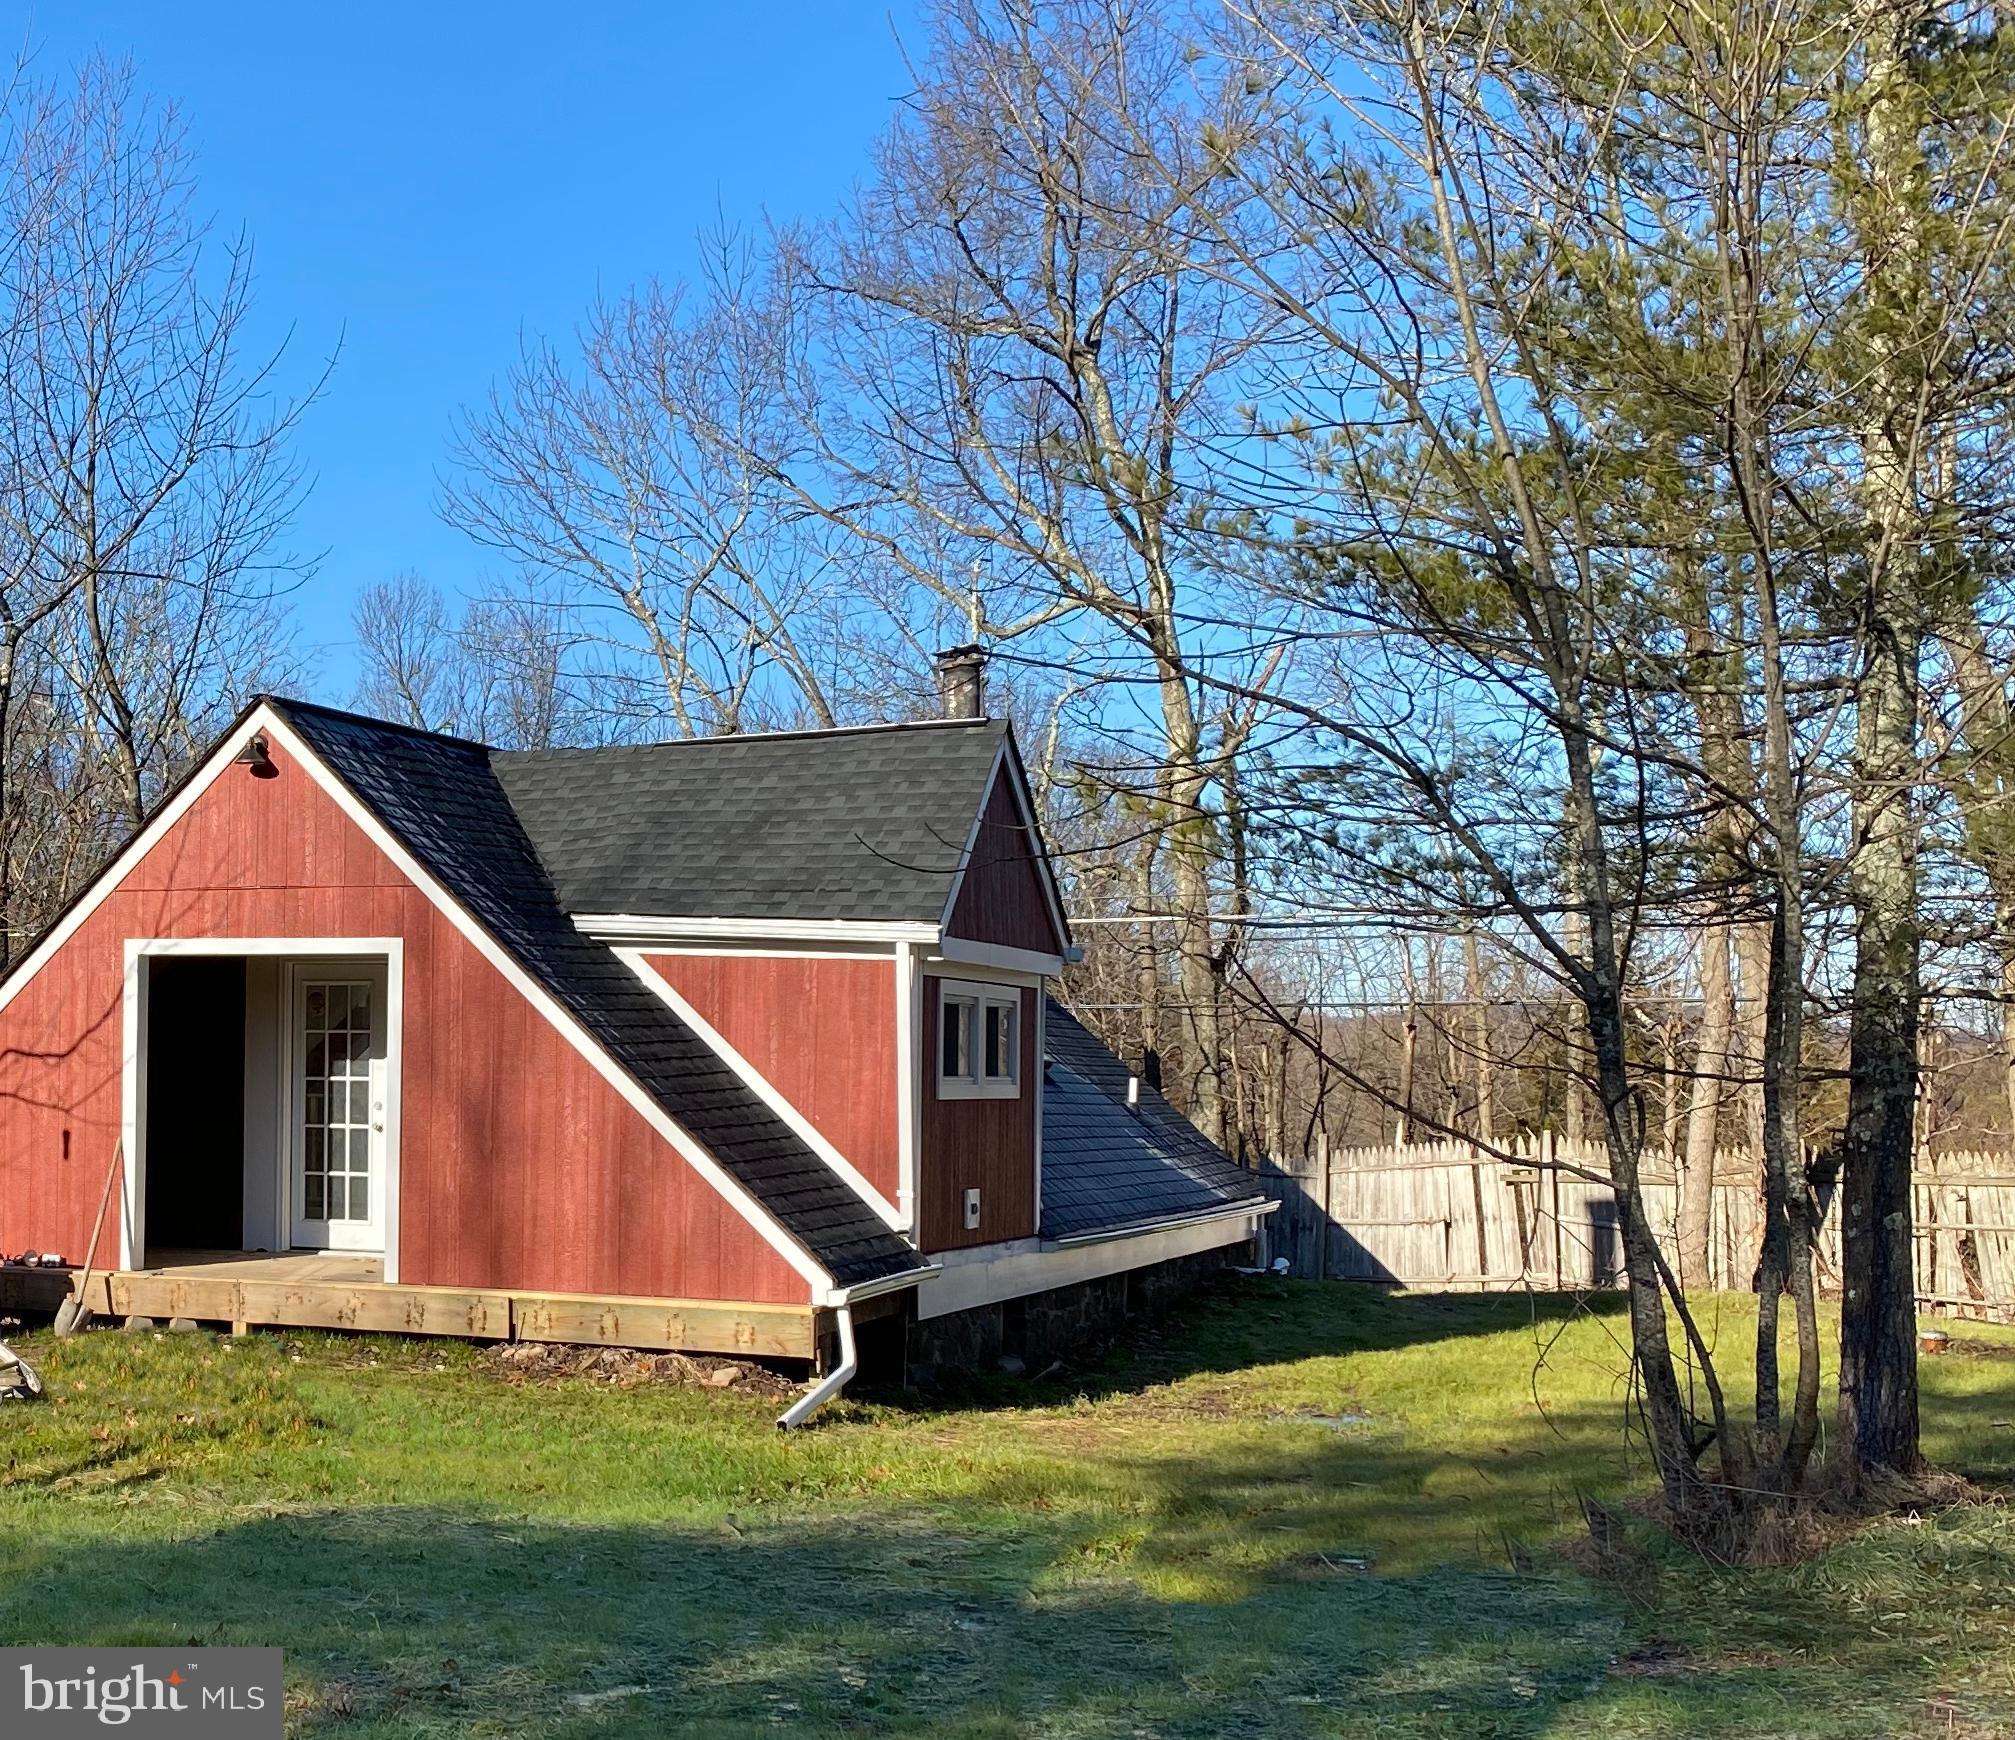 3342 Bursonville Road, Riegelsville, PA 18077